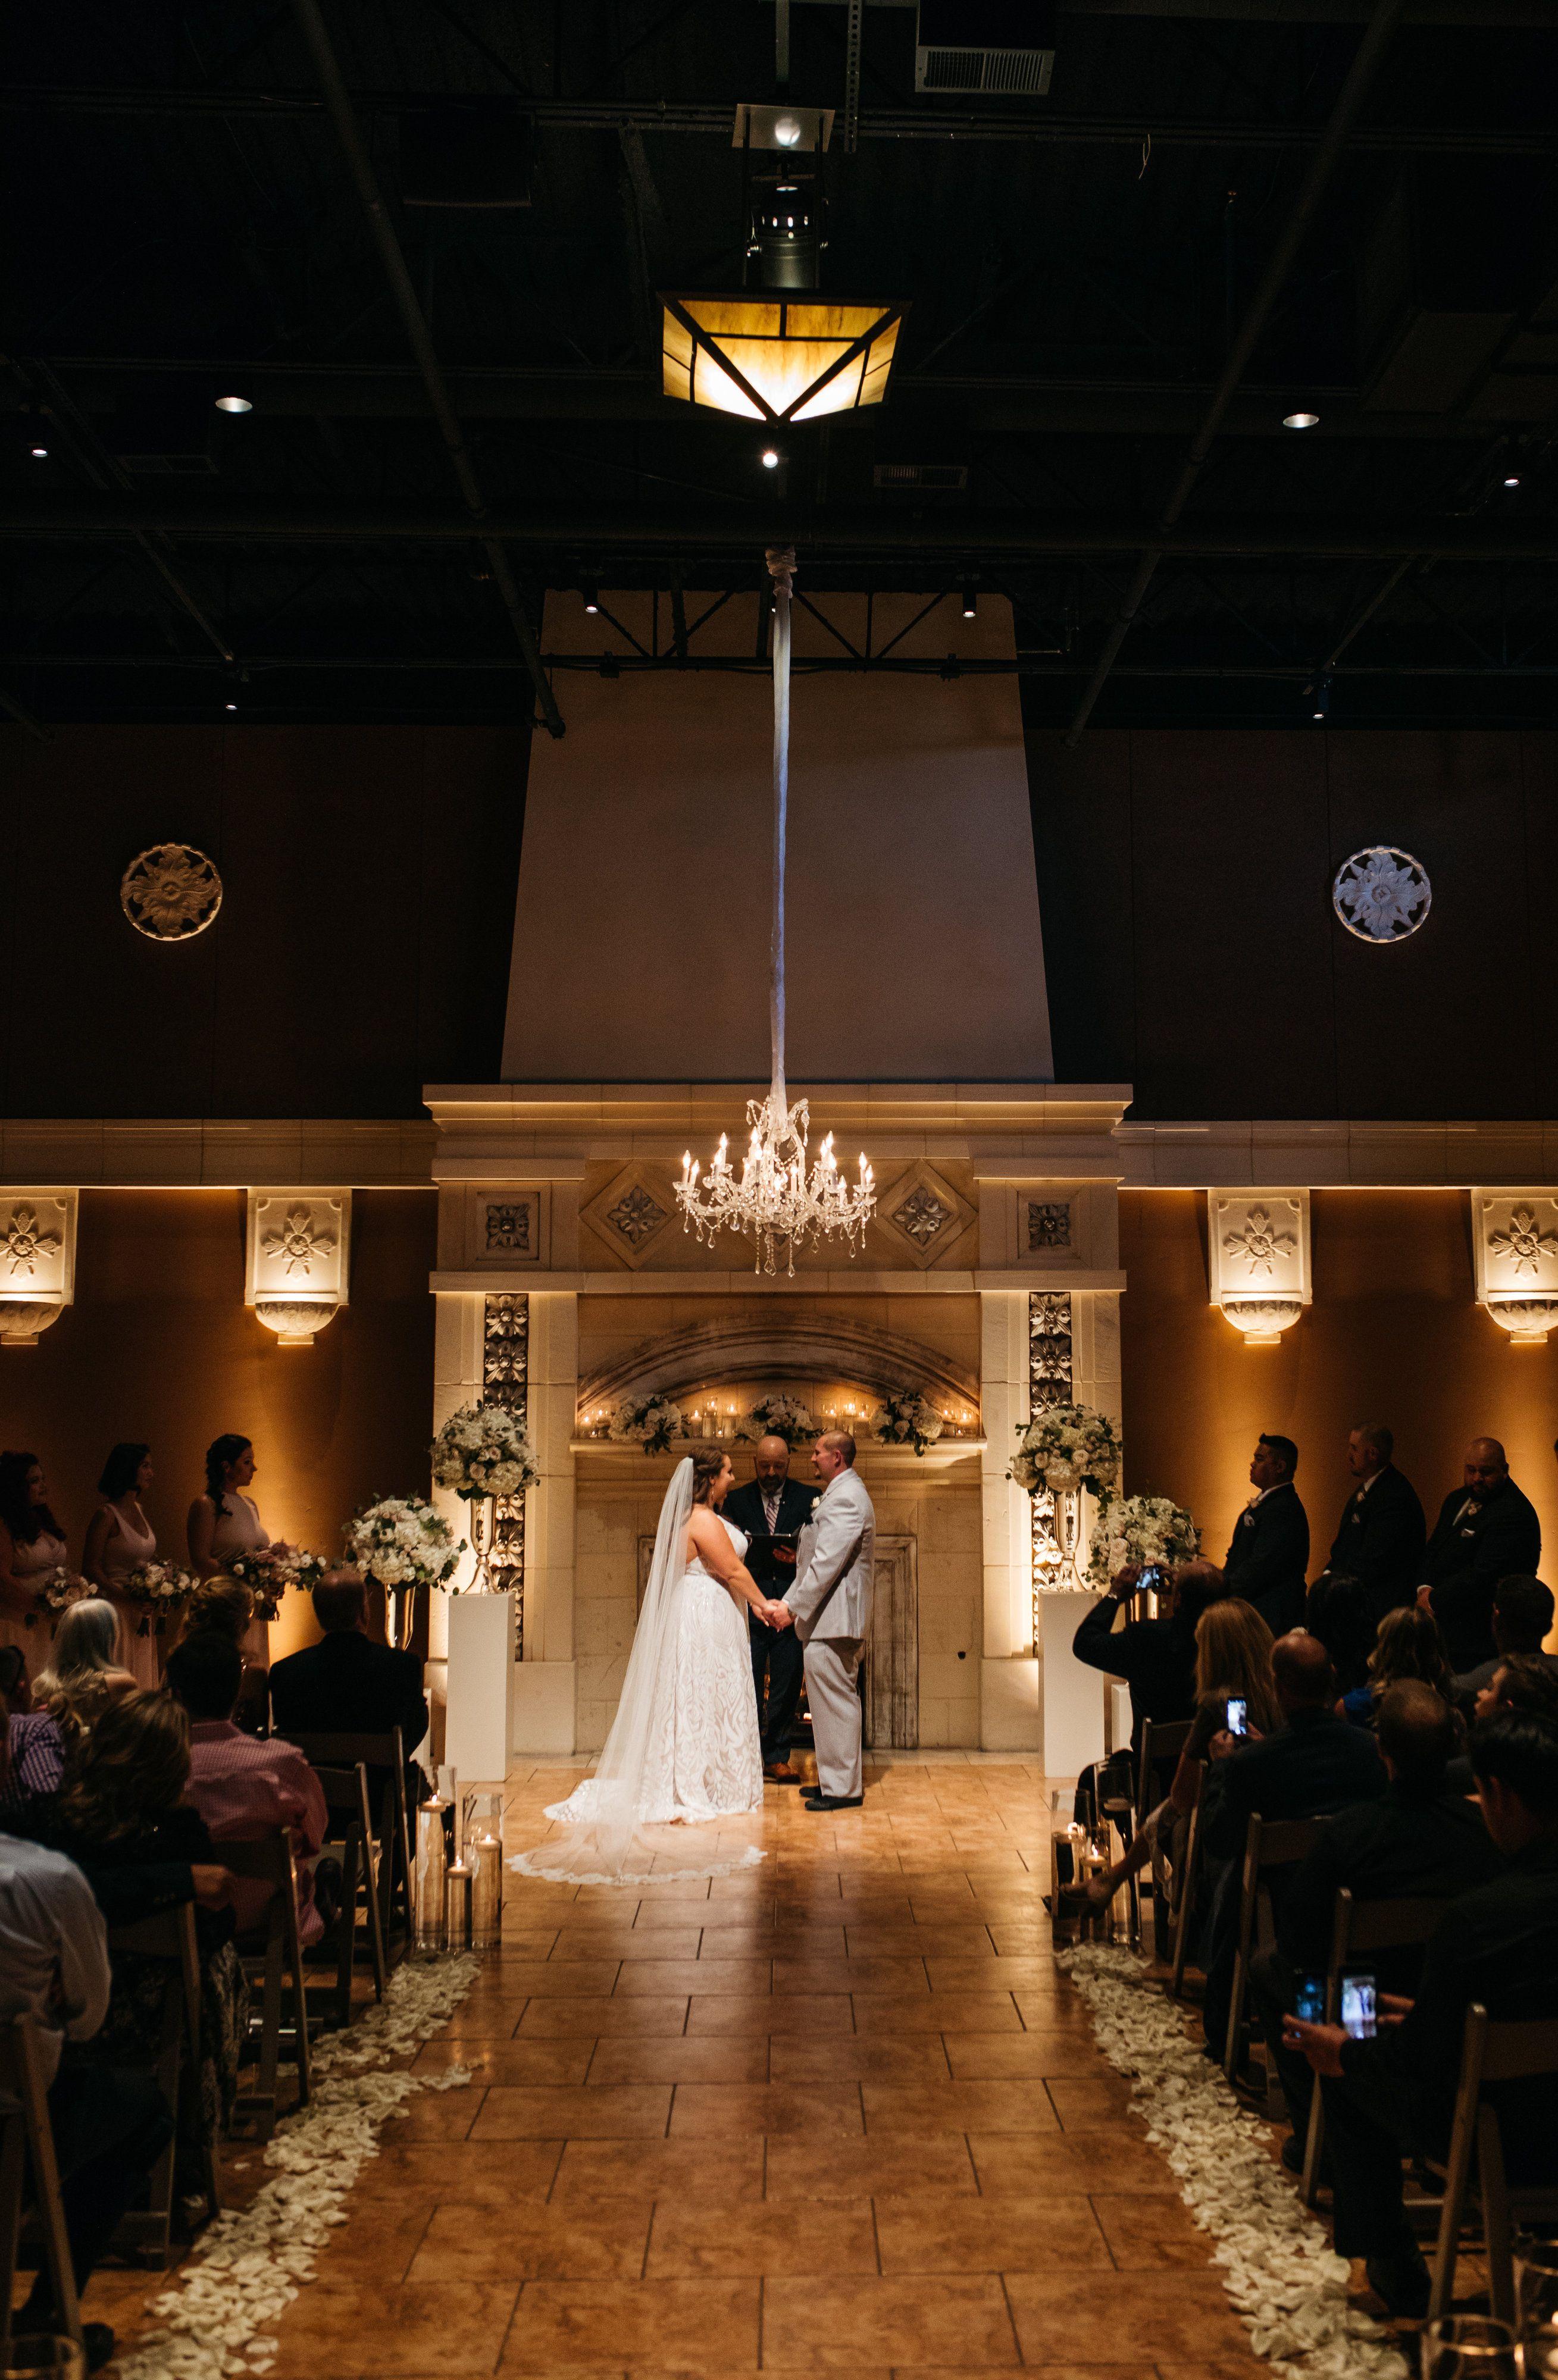 Dim Lights Are The Key To A Romantic Vibe Dim Lighting Lights